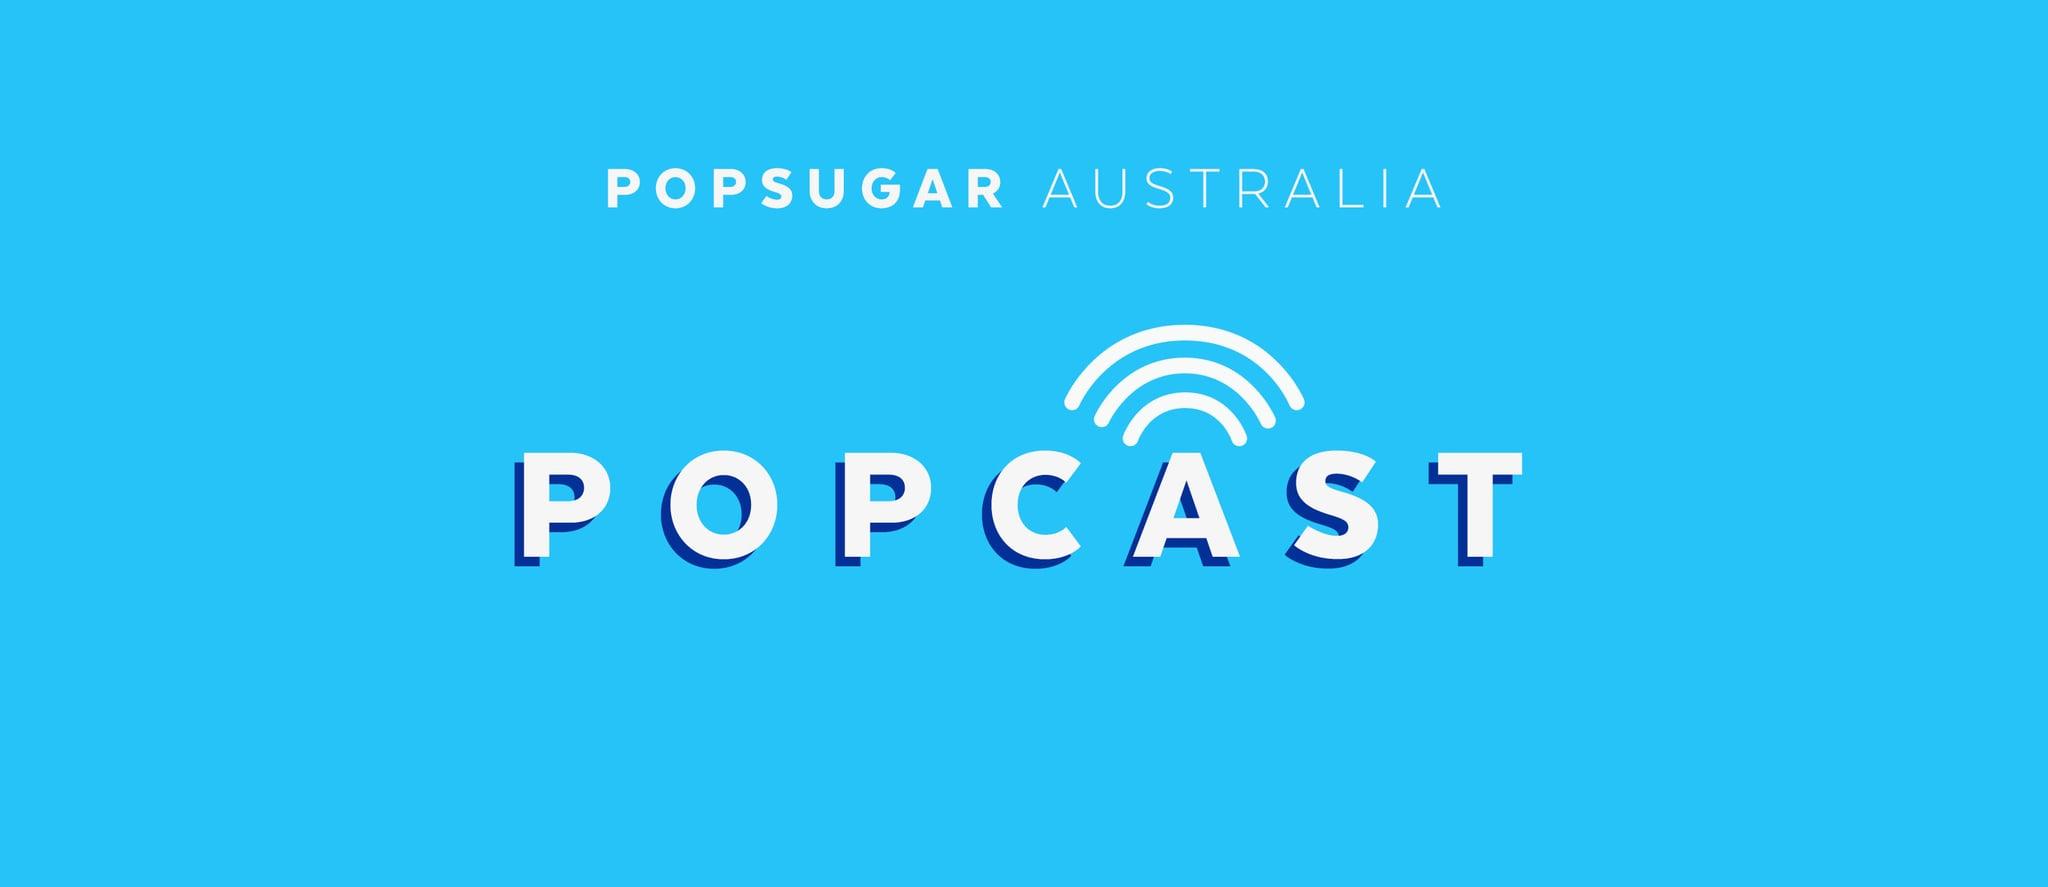 https://www.popsugar.com.au/celebrity/Popcast-POPSUGAR-Australia-Podcast-44597455